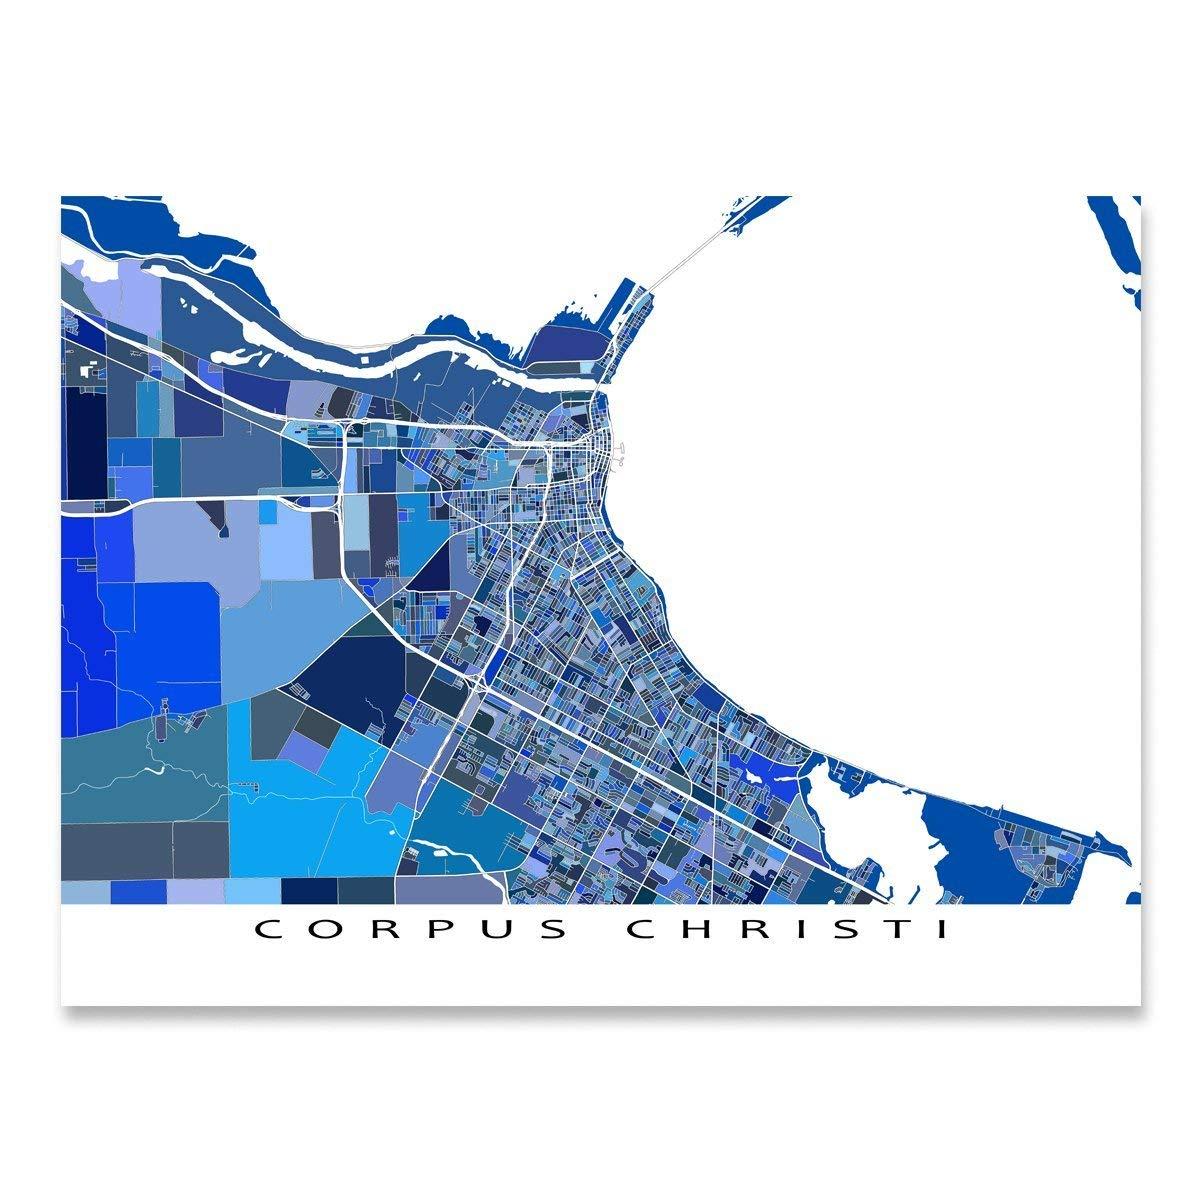 Corpus Christi Map Of Texas.Amazon Com Corpus Christi Map Print Texas Usa City Street Art